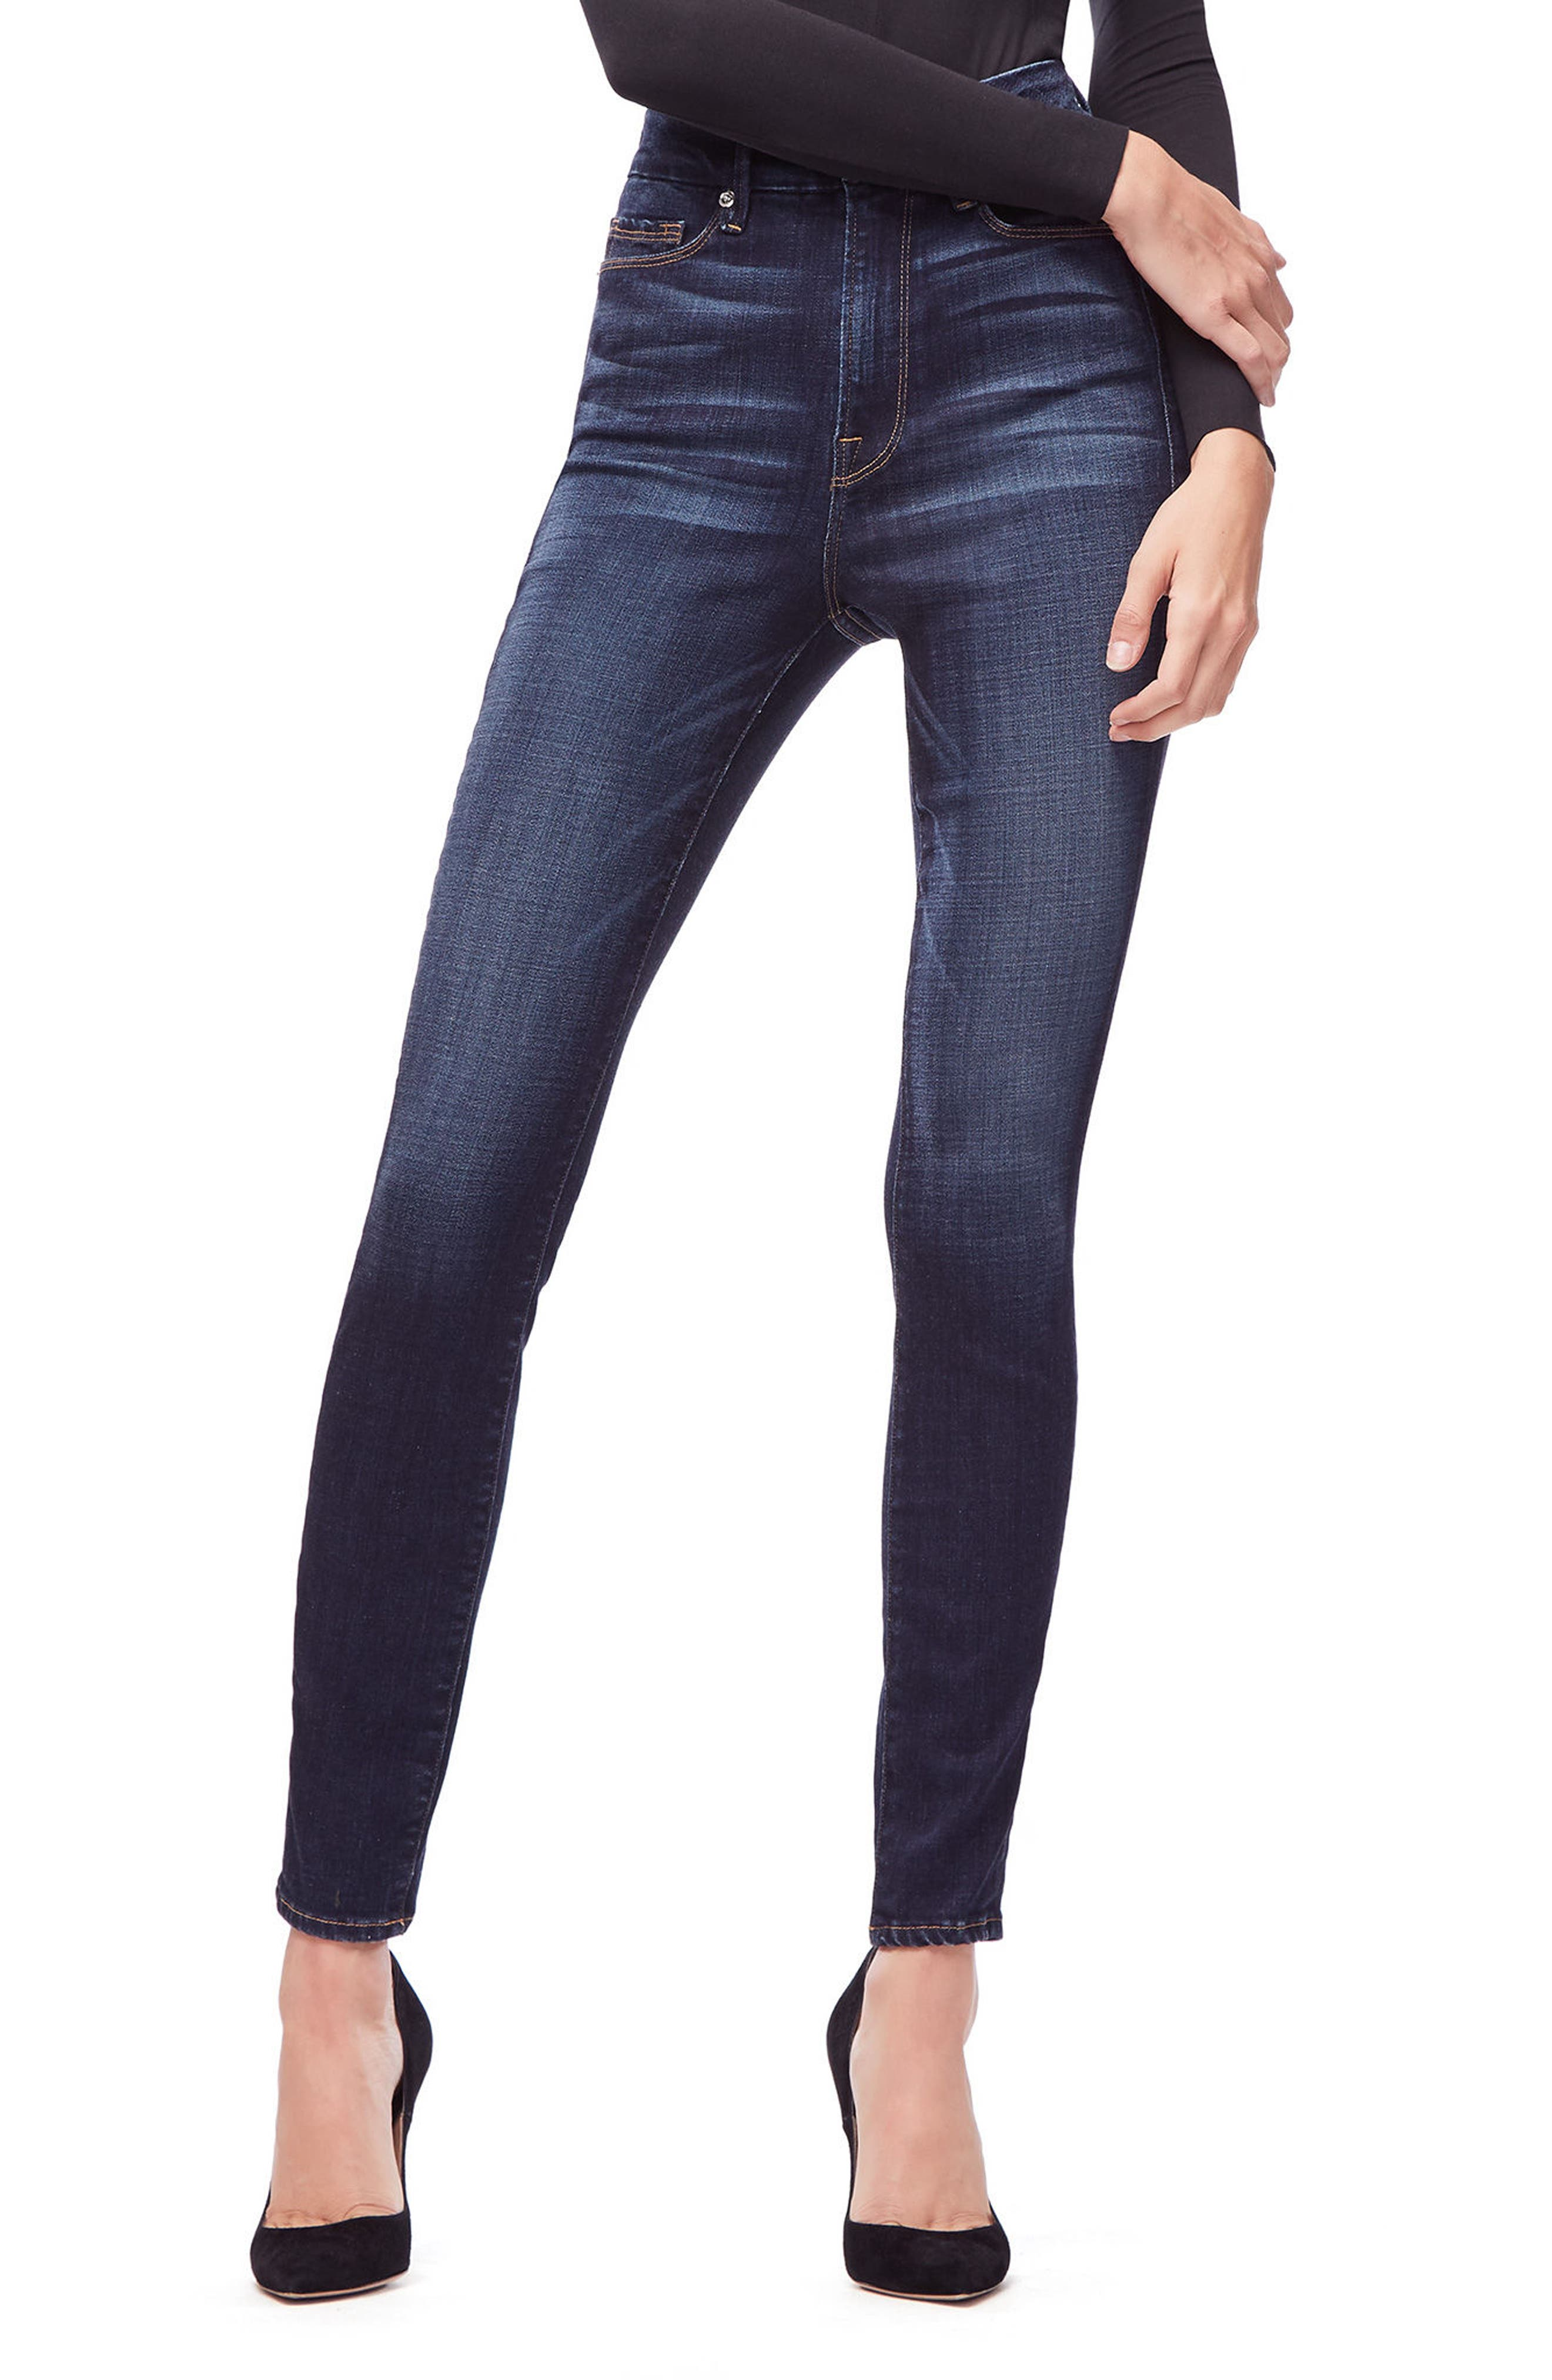 GOOD AMERICAN,                             Good Legs High Waist Skinny Jeans,                             Alternate thumbnail 5, color,                             401